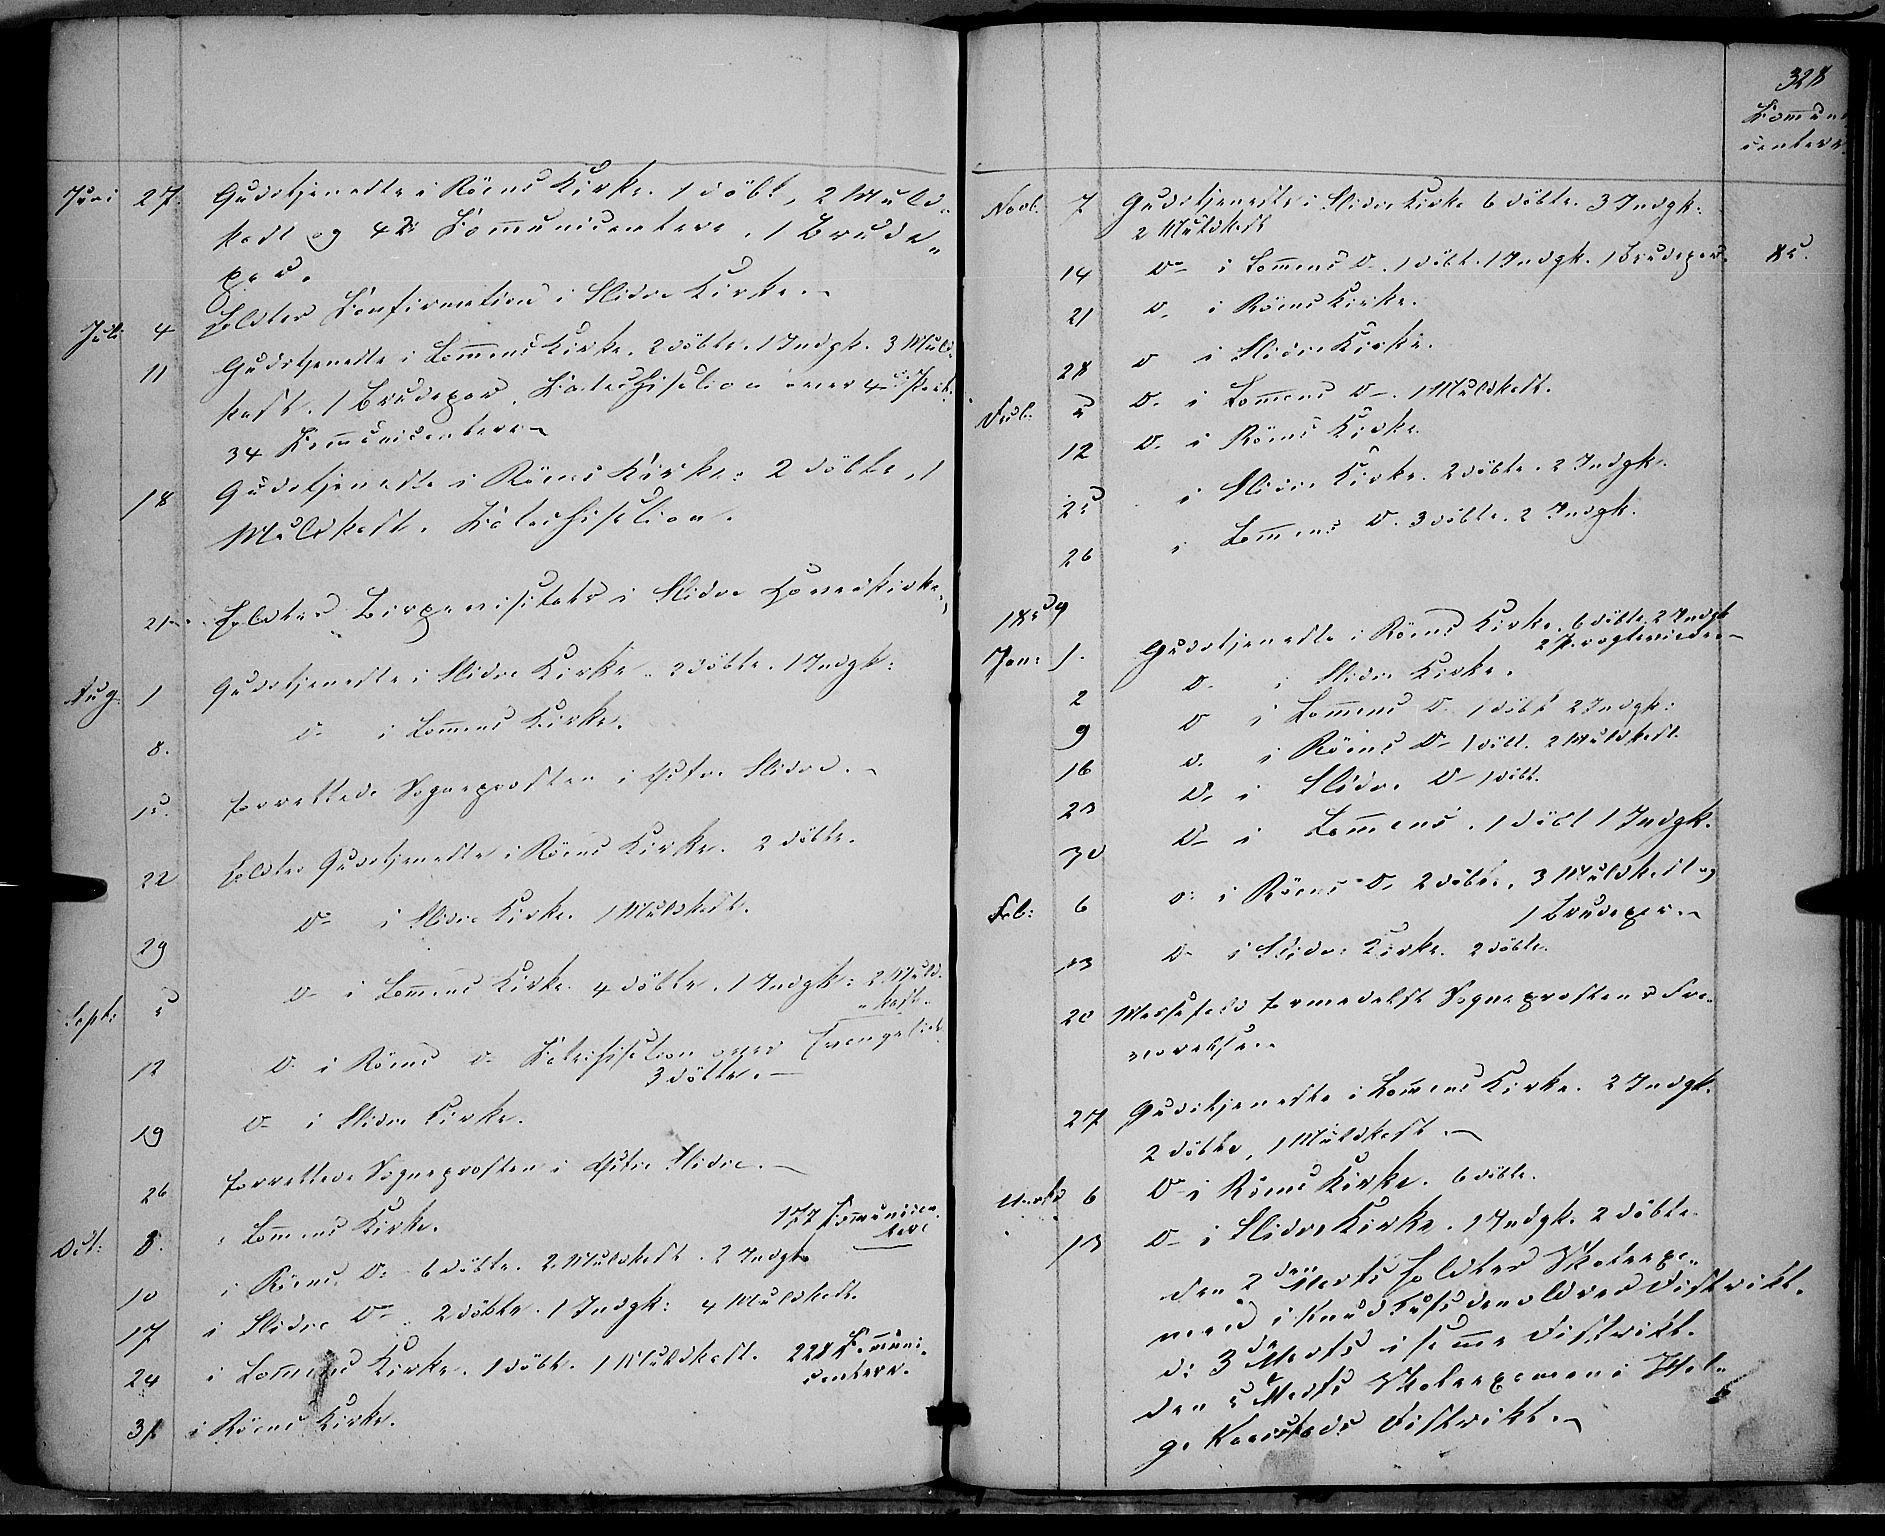 SAH, Vestre Slidre prestekontor, Ministerialbok nr. 2, 1856-1864, s. 328